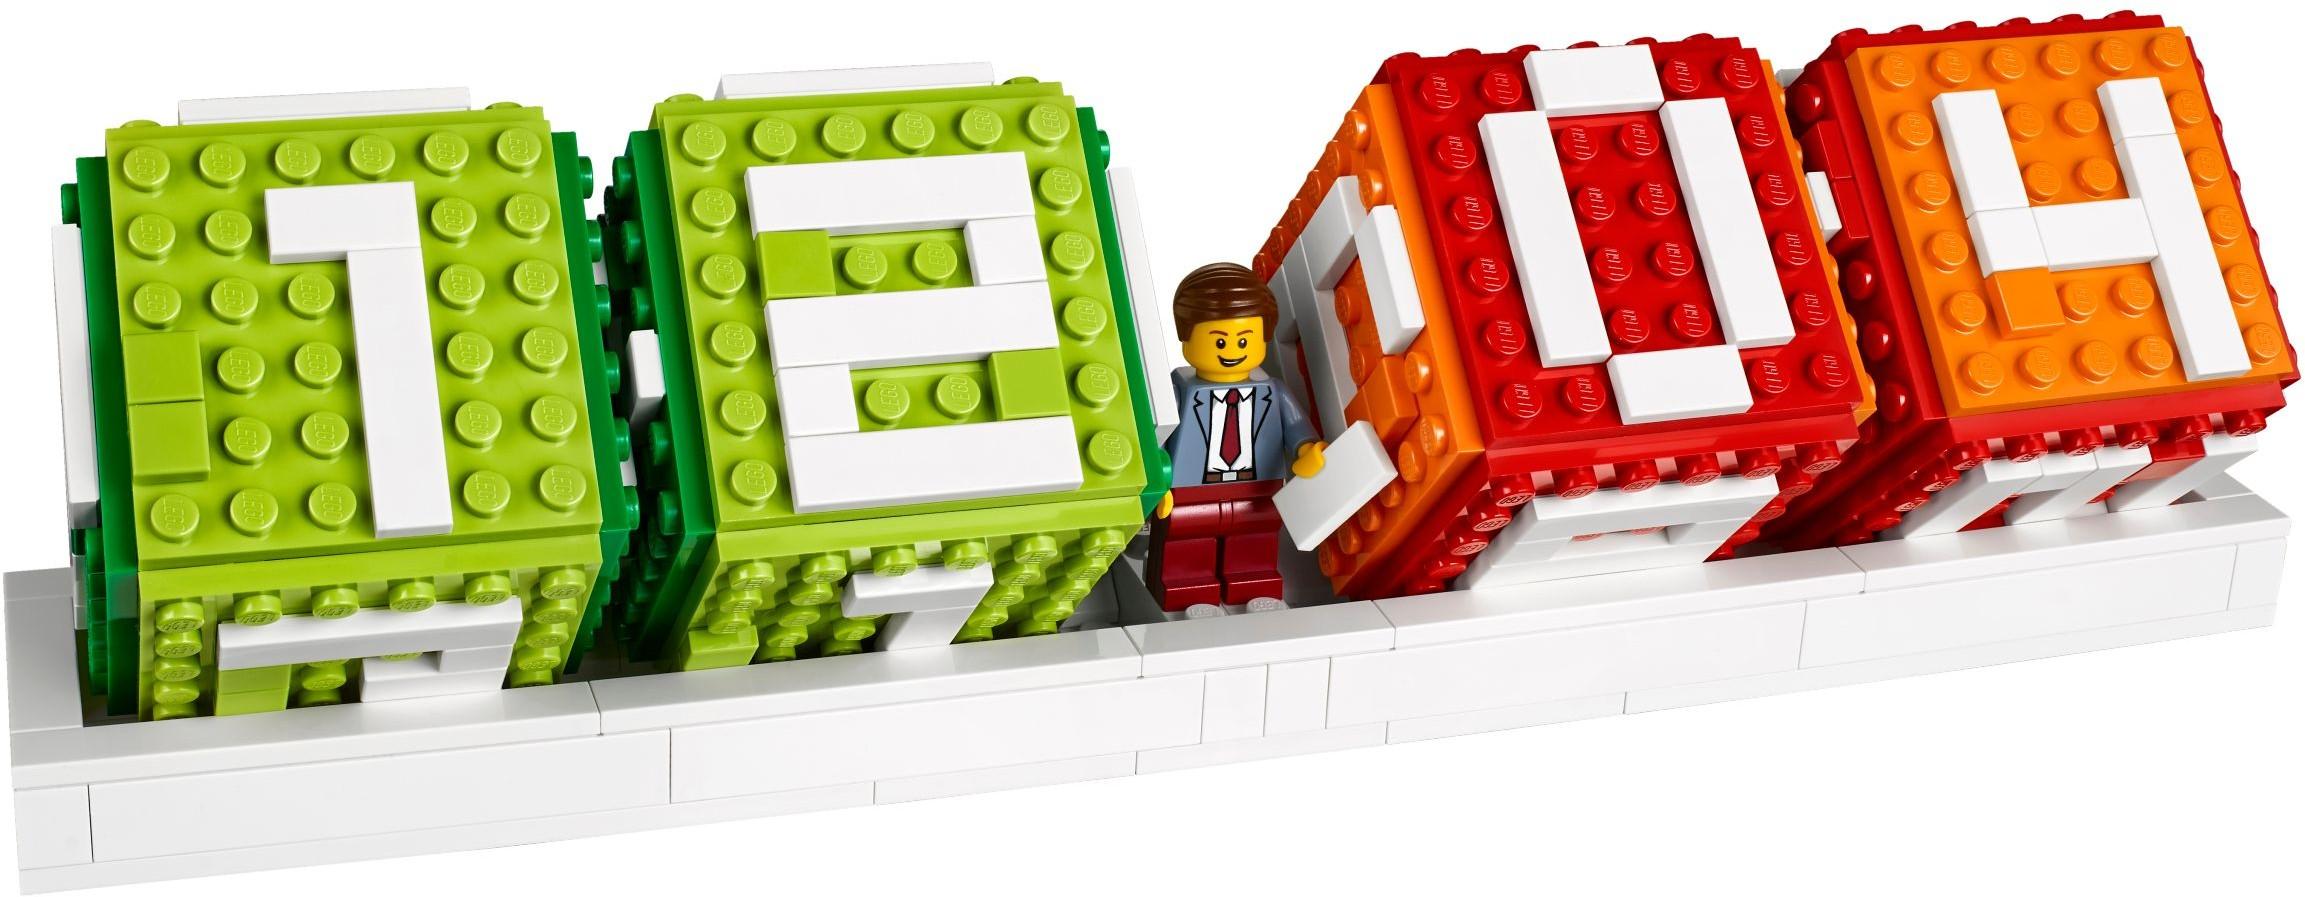 Miscellaneous Brickset Lego Set Guide And Database